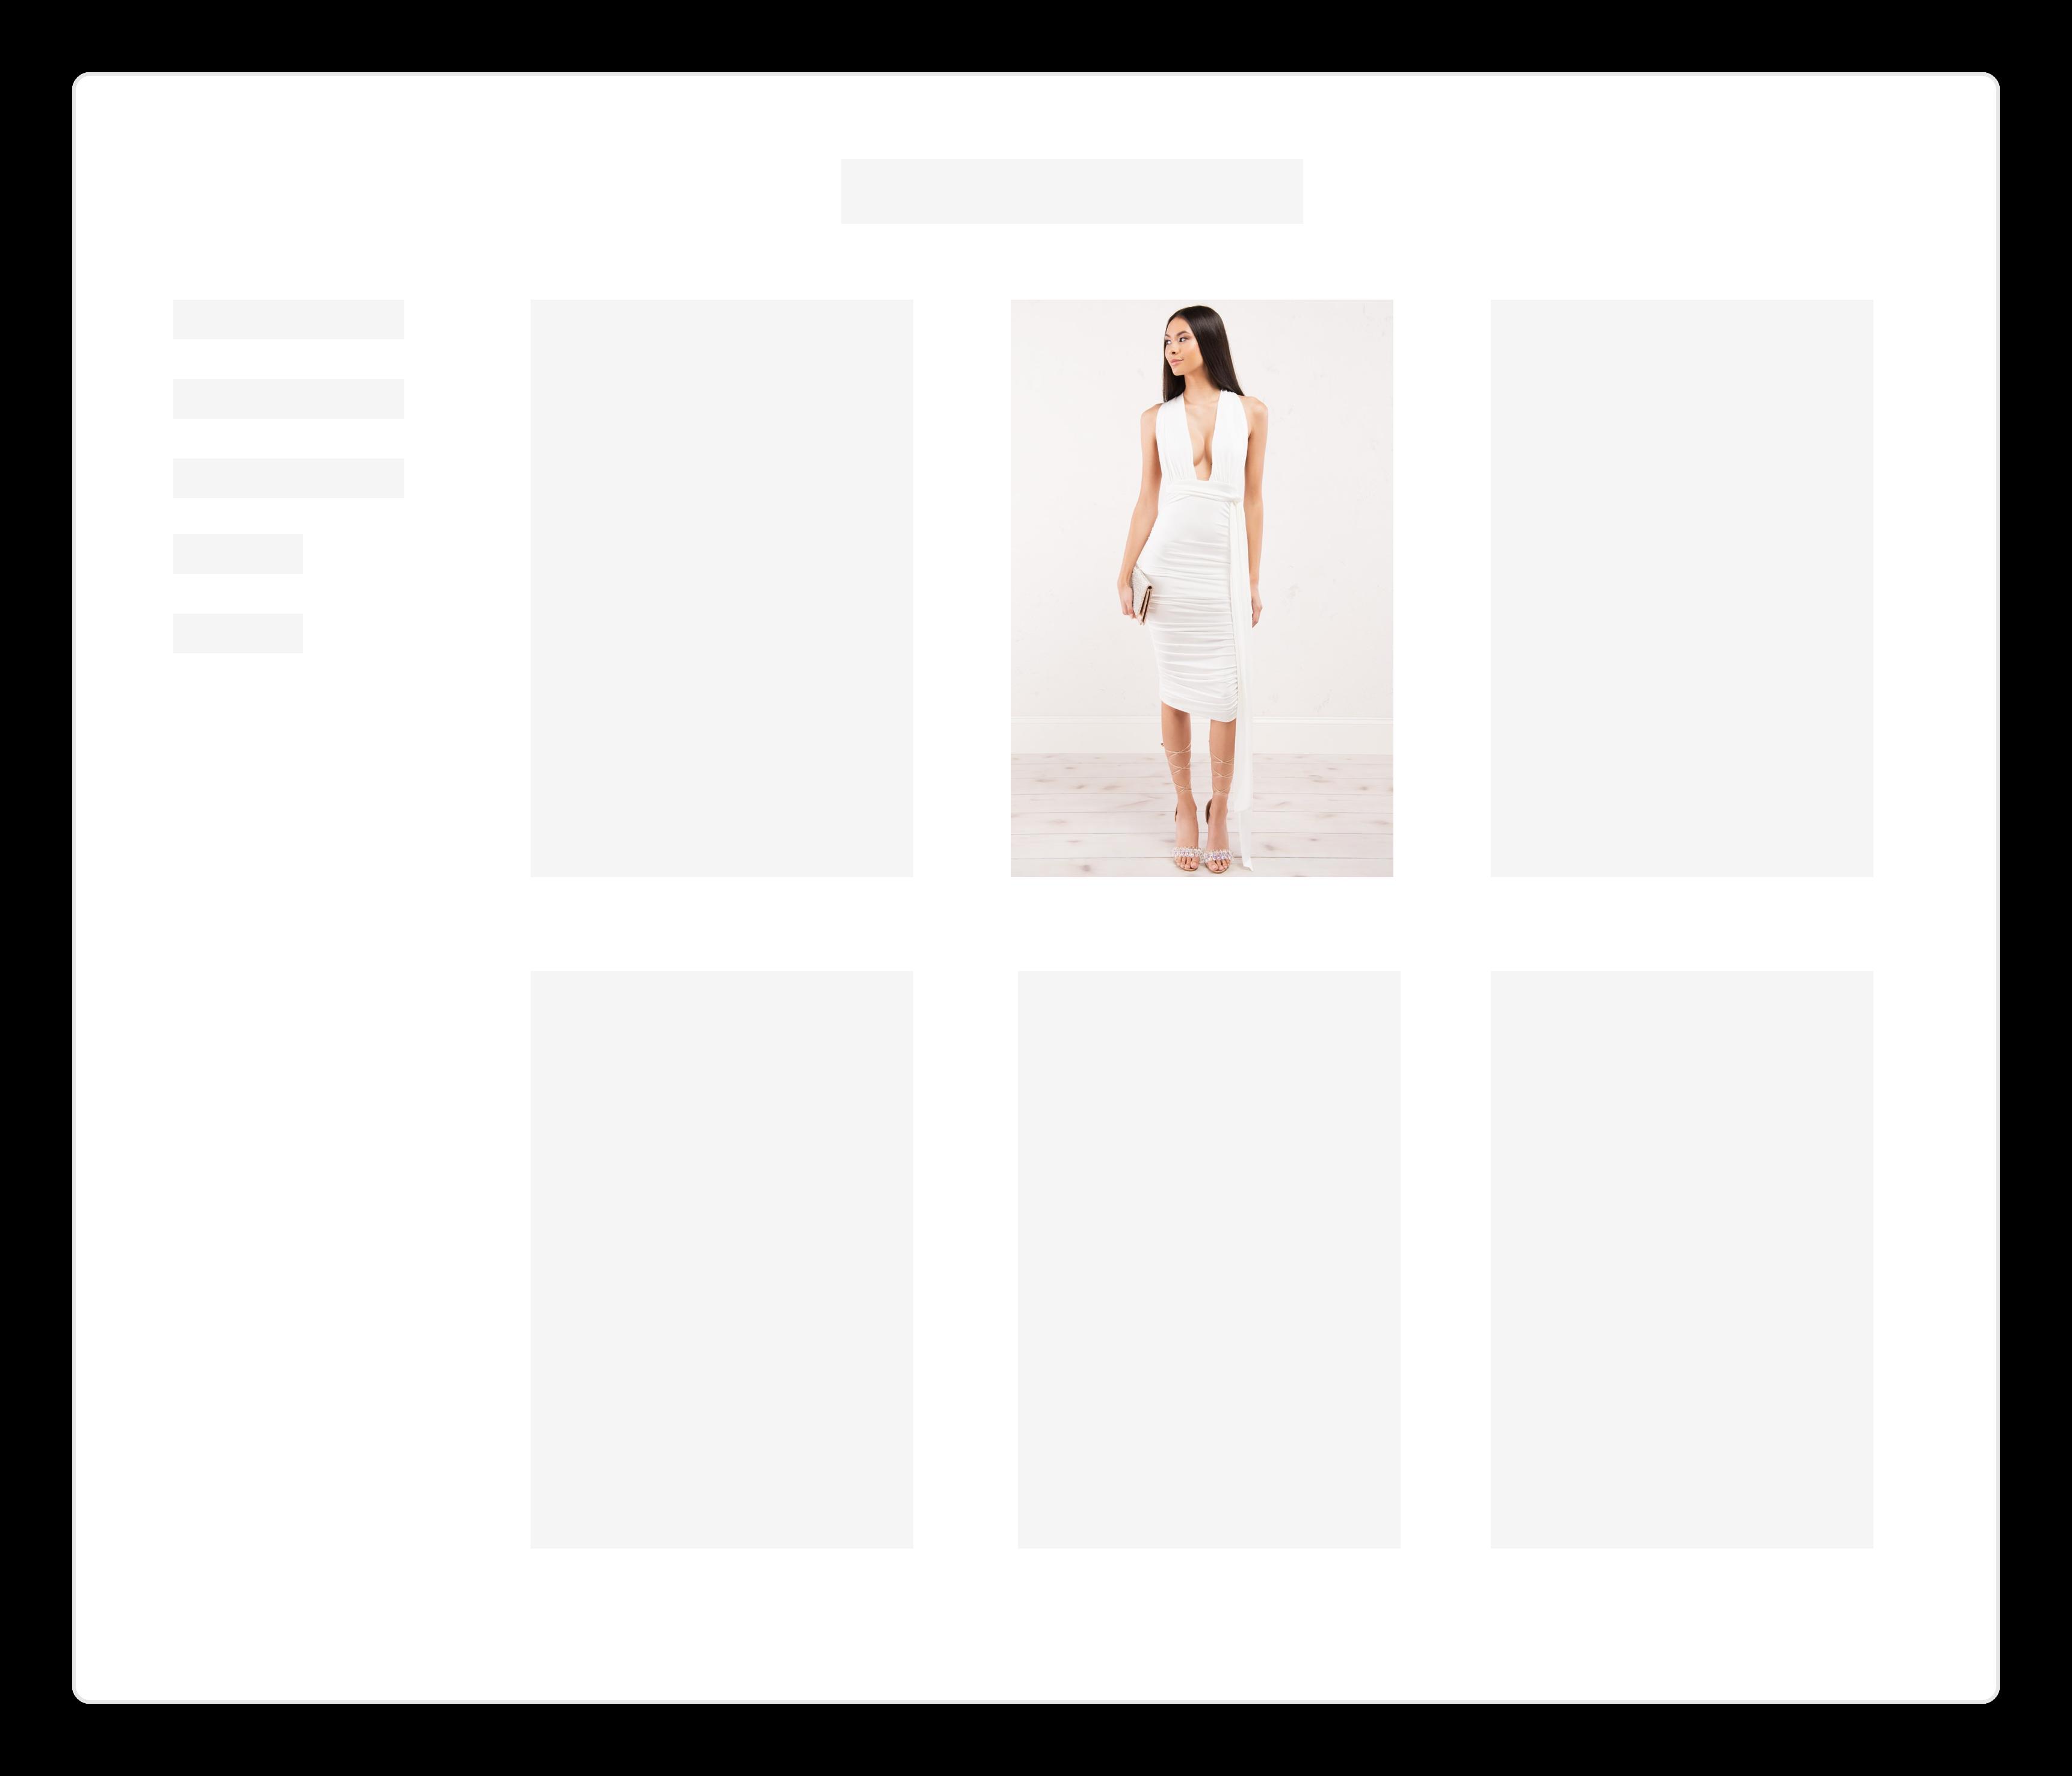 webpage_mock_similar